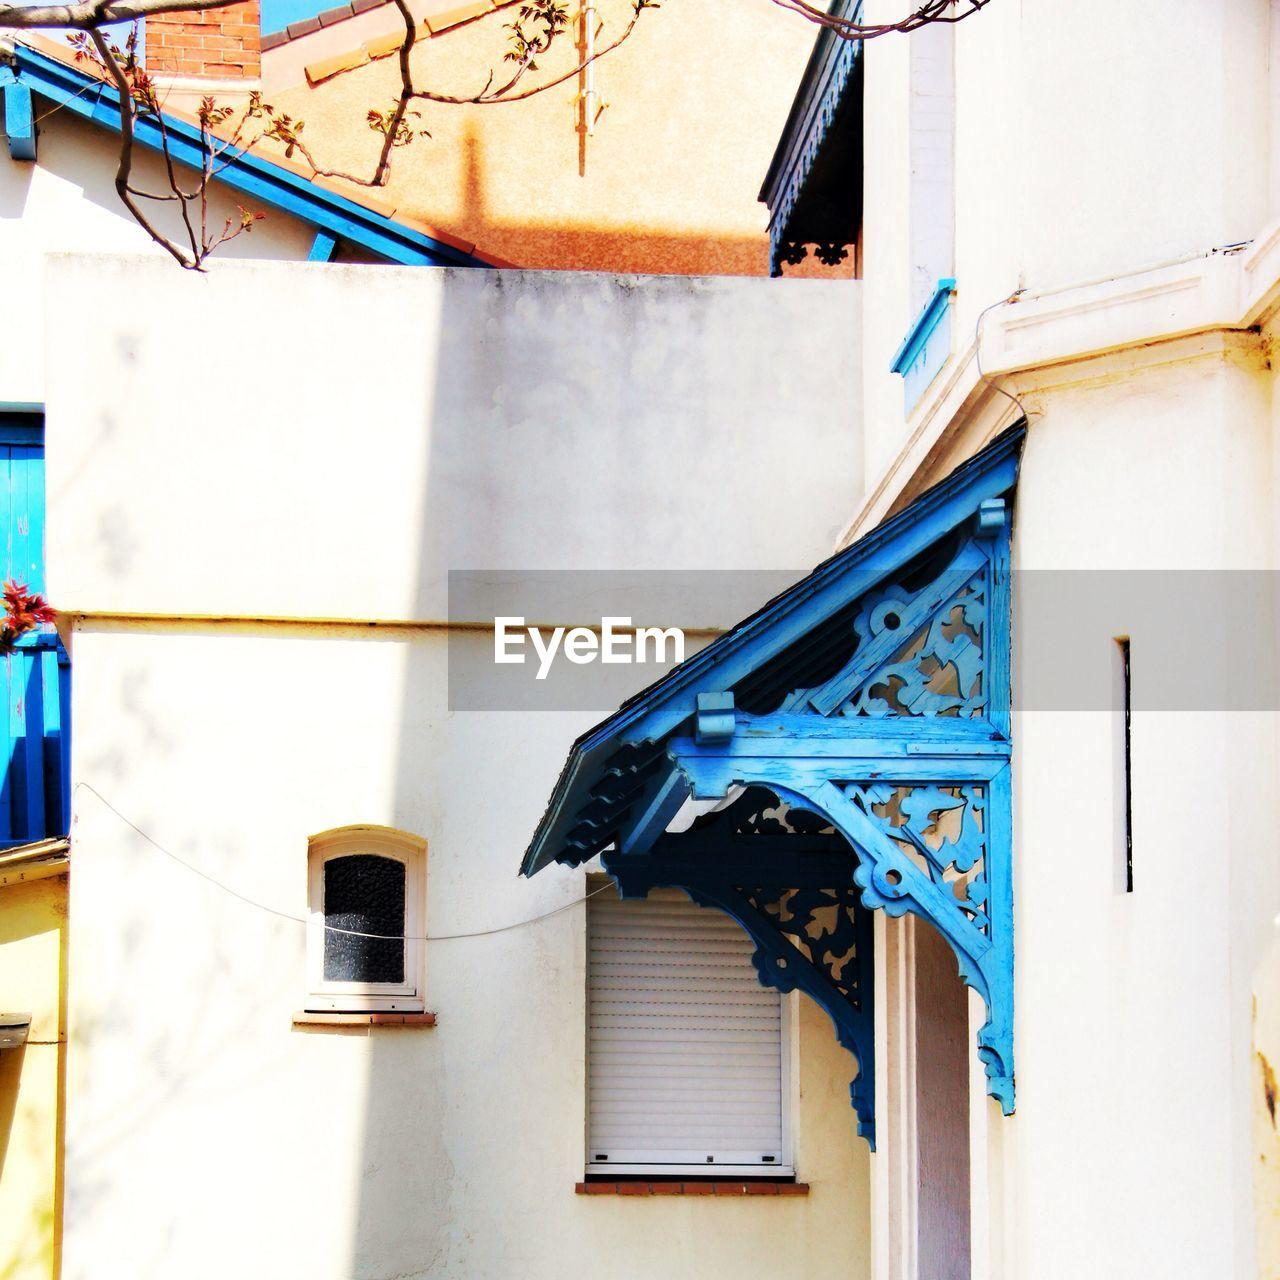 Close up image of building exteriors